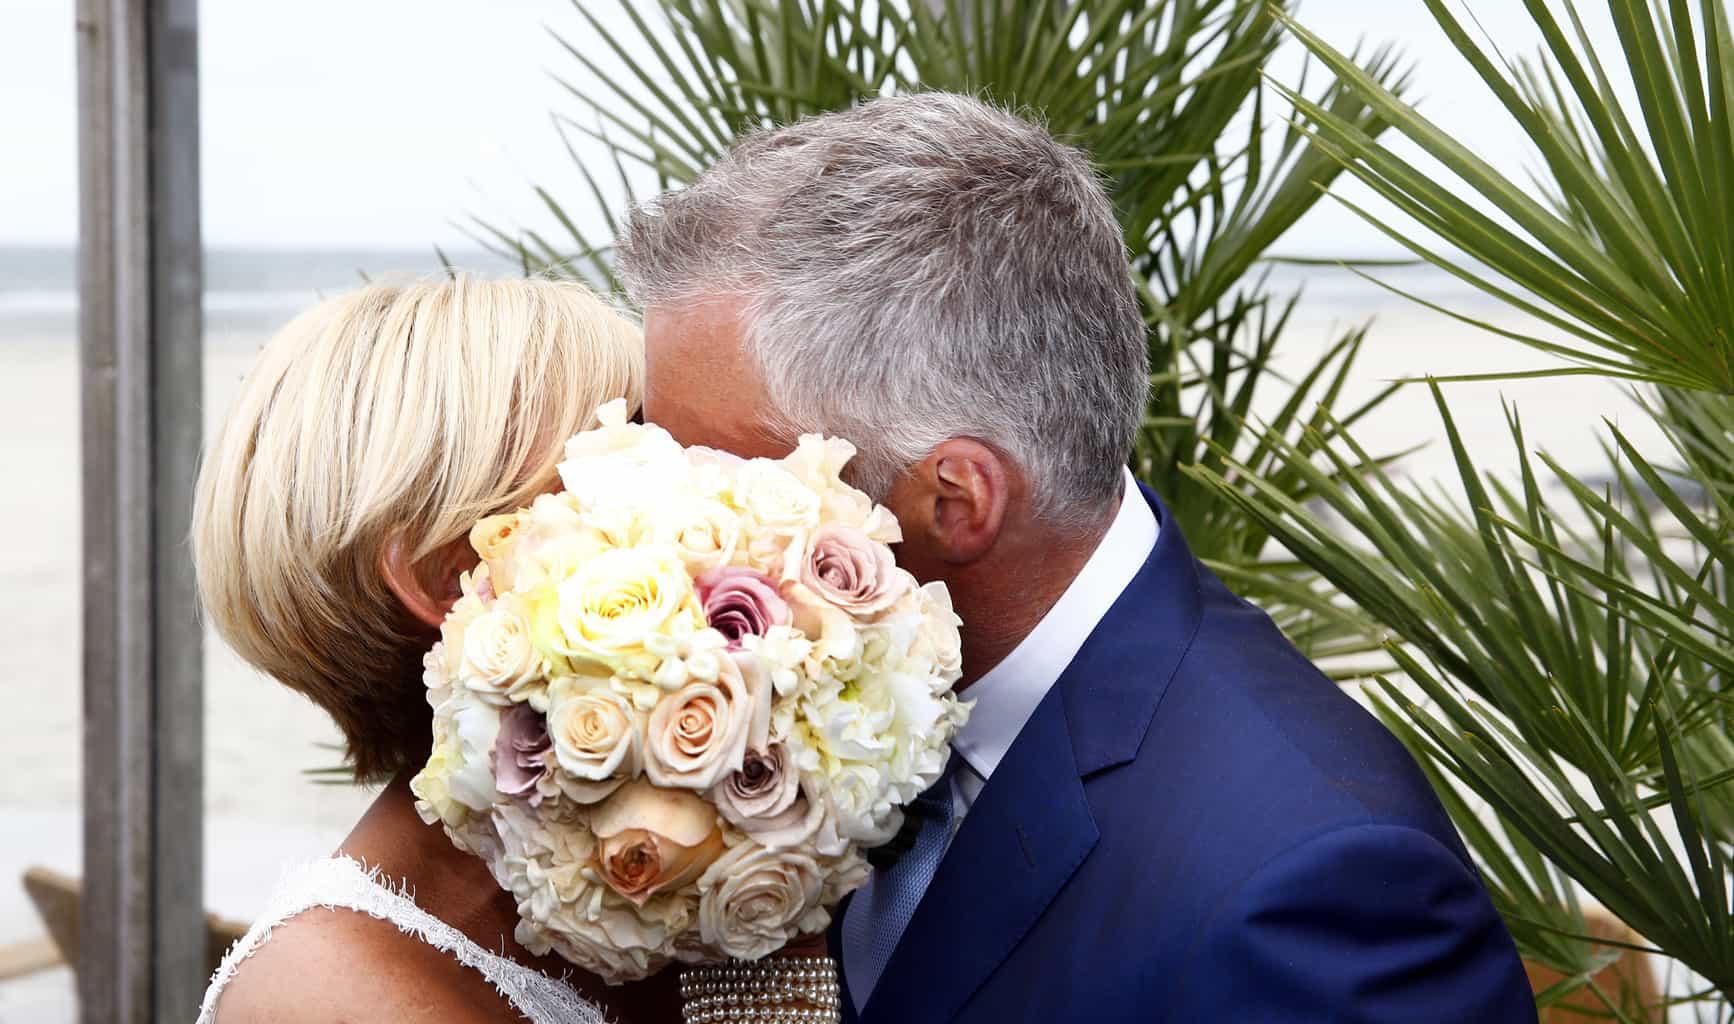 VLIELAND 19 JUNI 2014 Caroline Tensen en Ernst Jan Smids trouwen op vlieland.